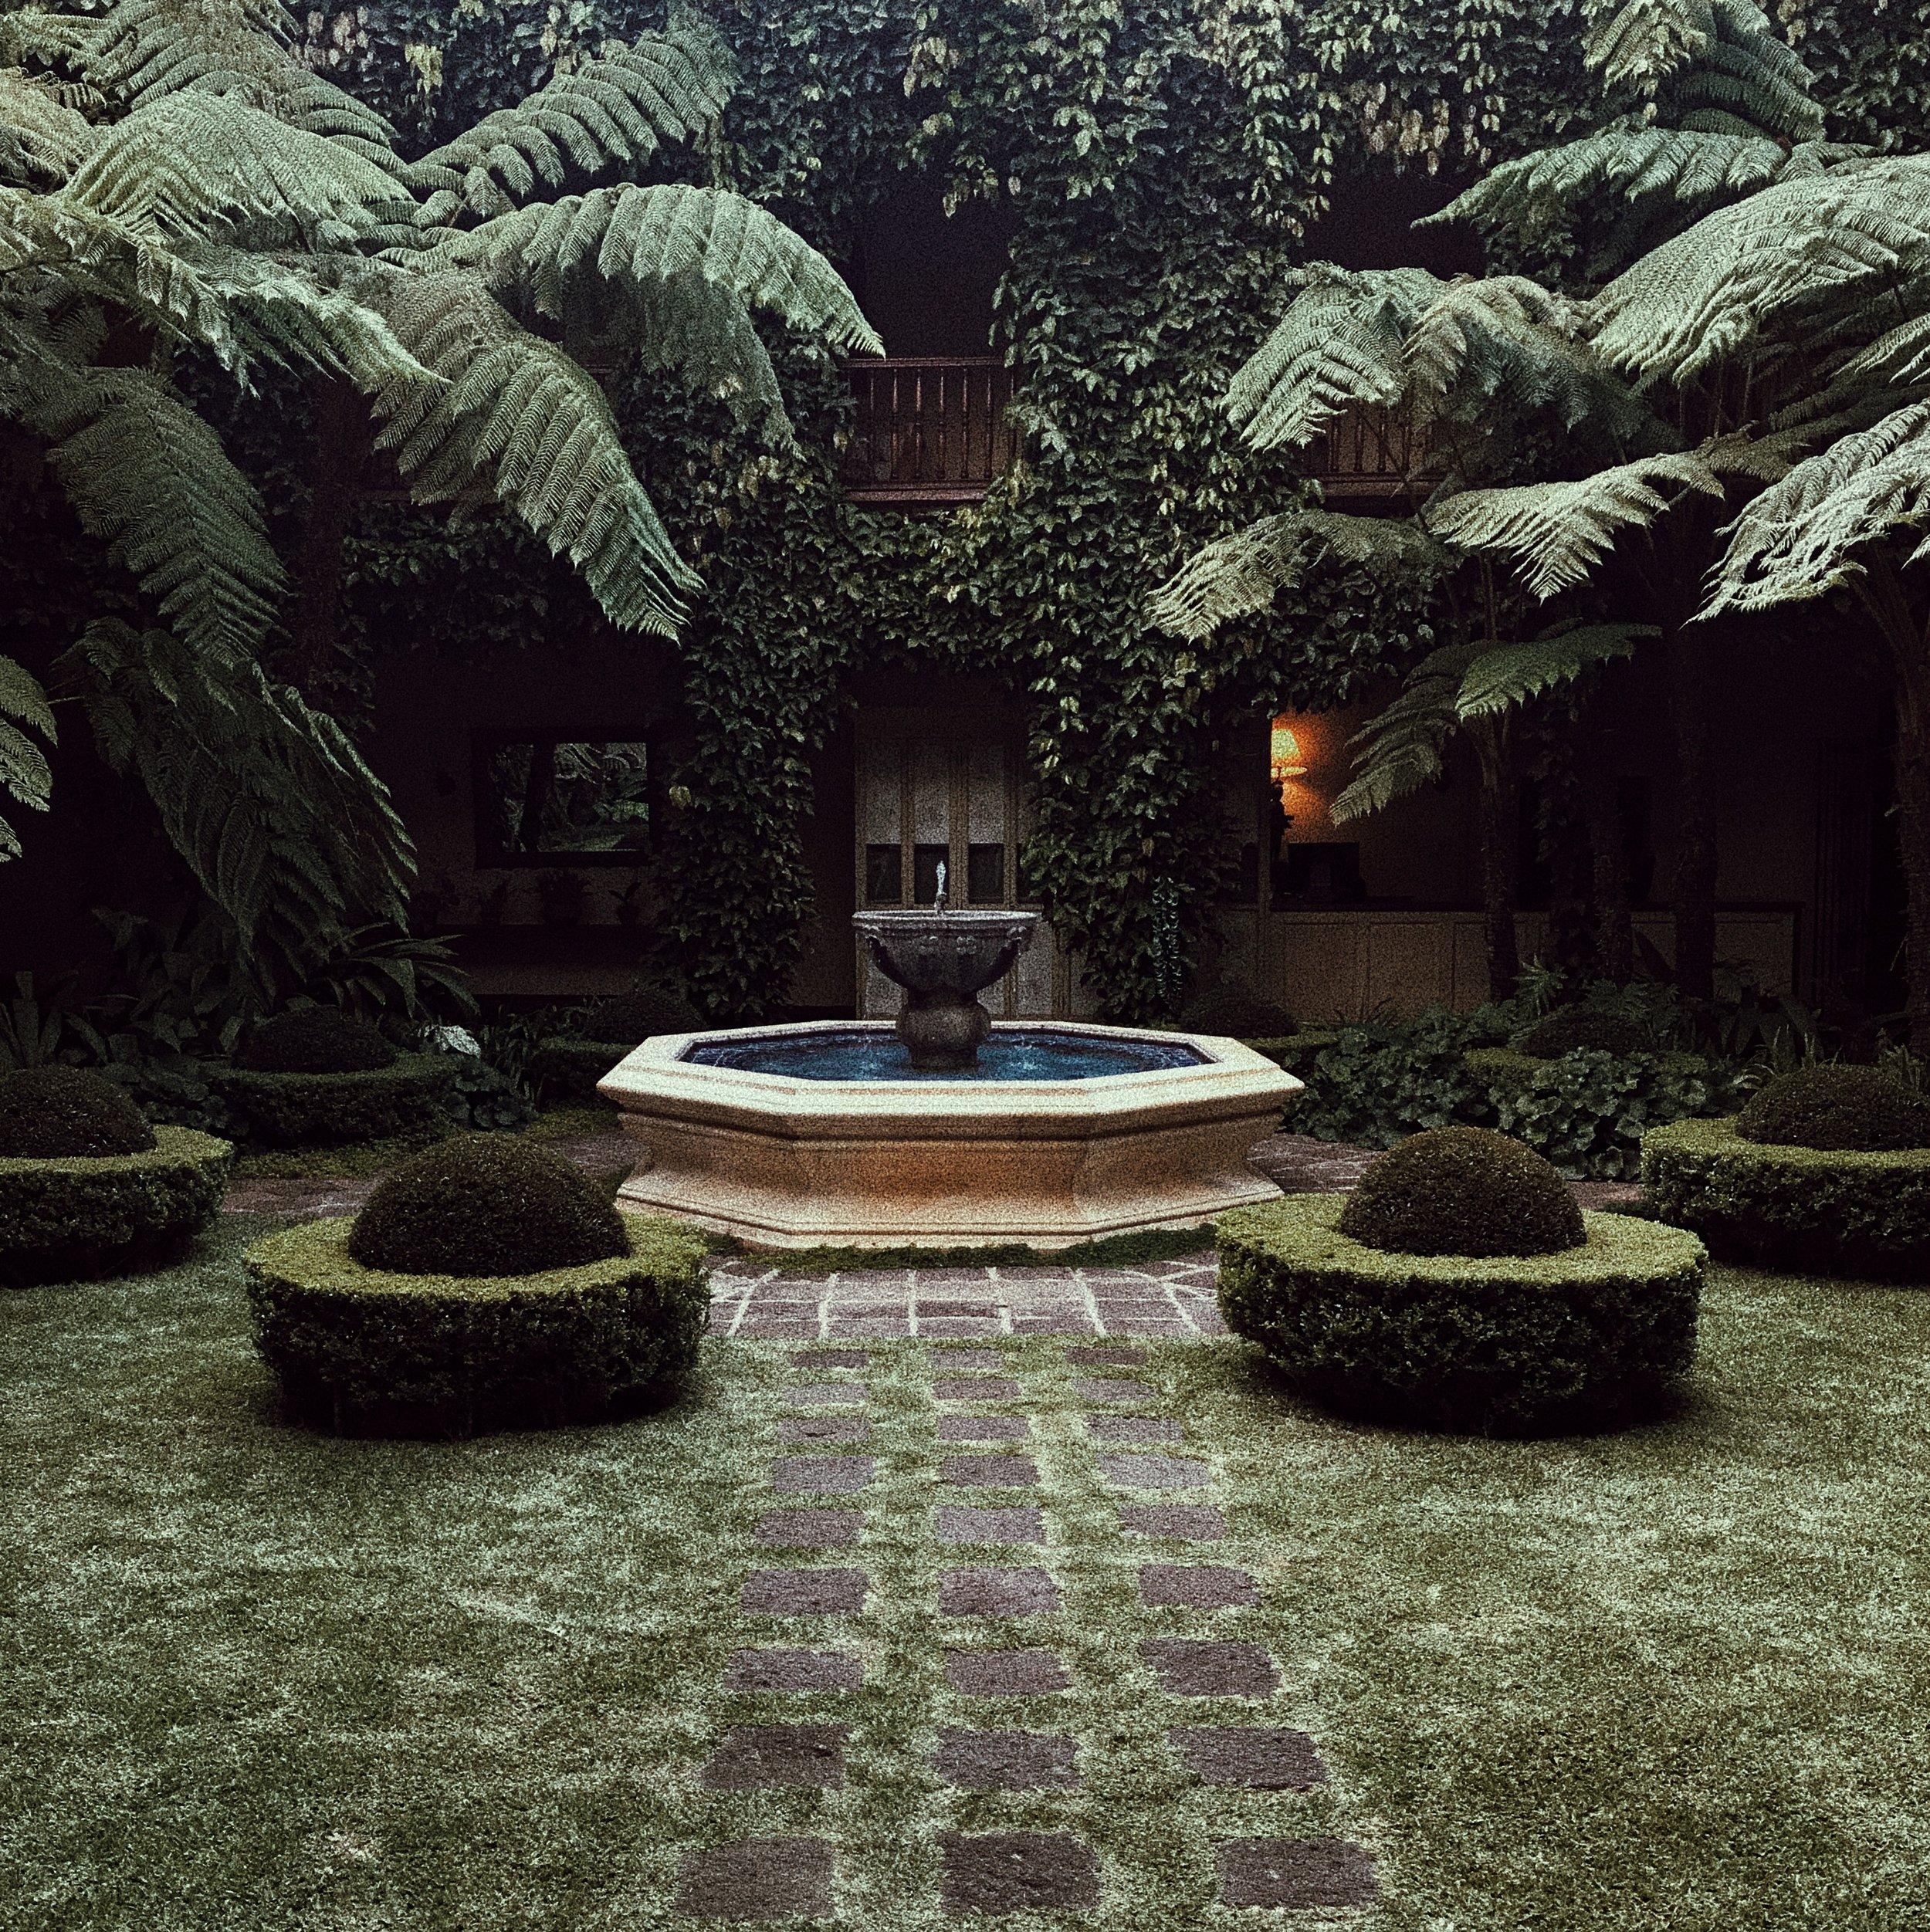 The garden of Palacio de Dona Leonor behind the tea room.